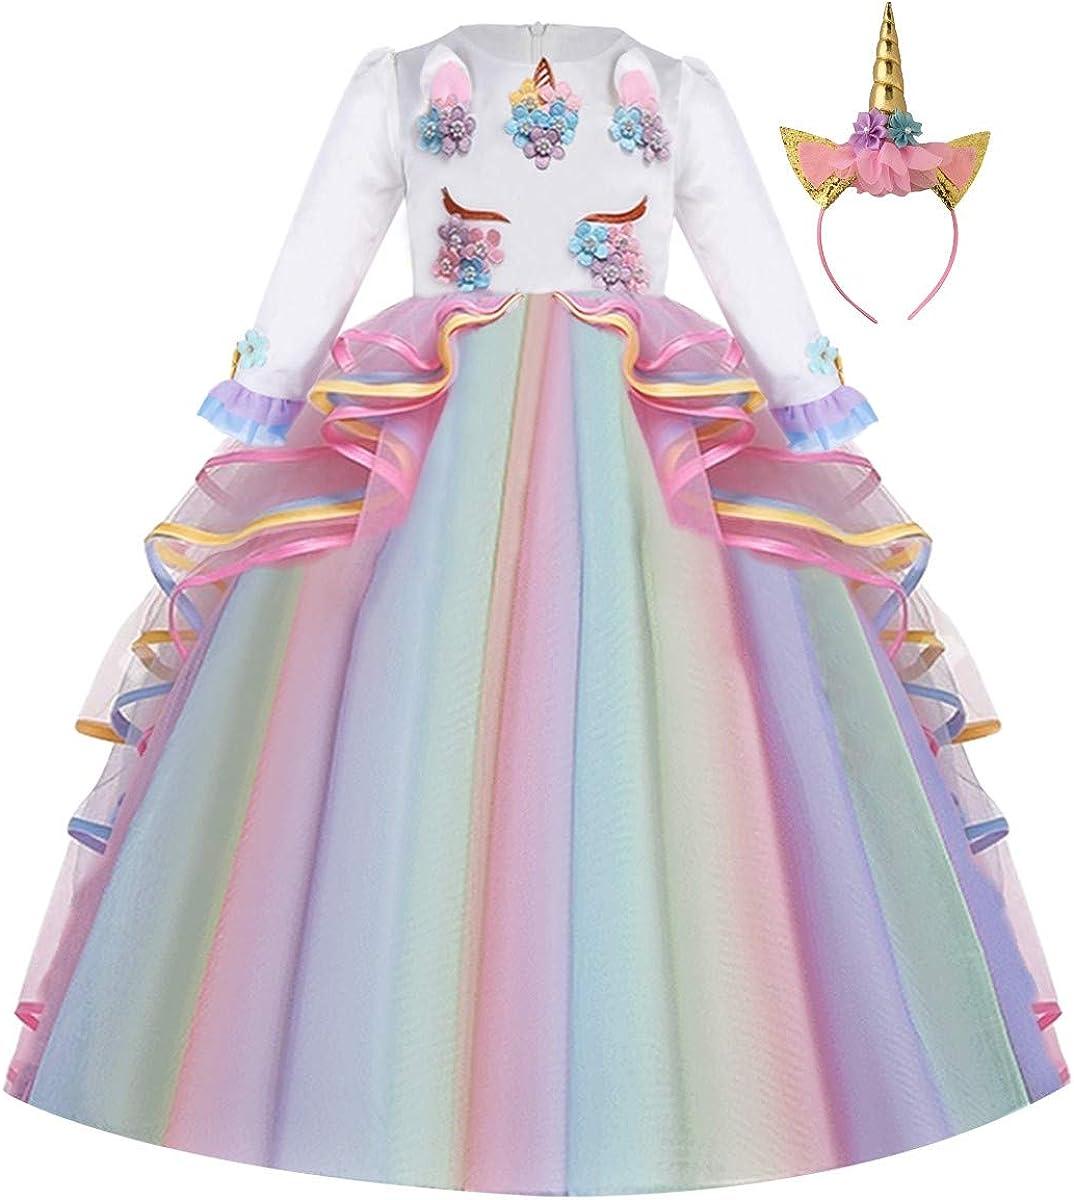 MYRISAM Unicorn Costume Princess Birthday Party Pe Max 73% OFF Pageant In stock Dance